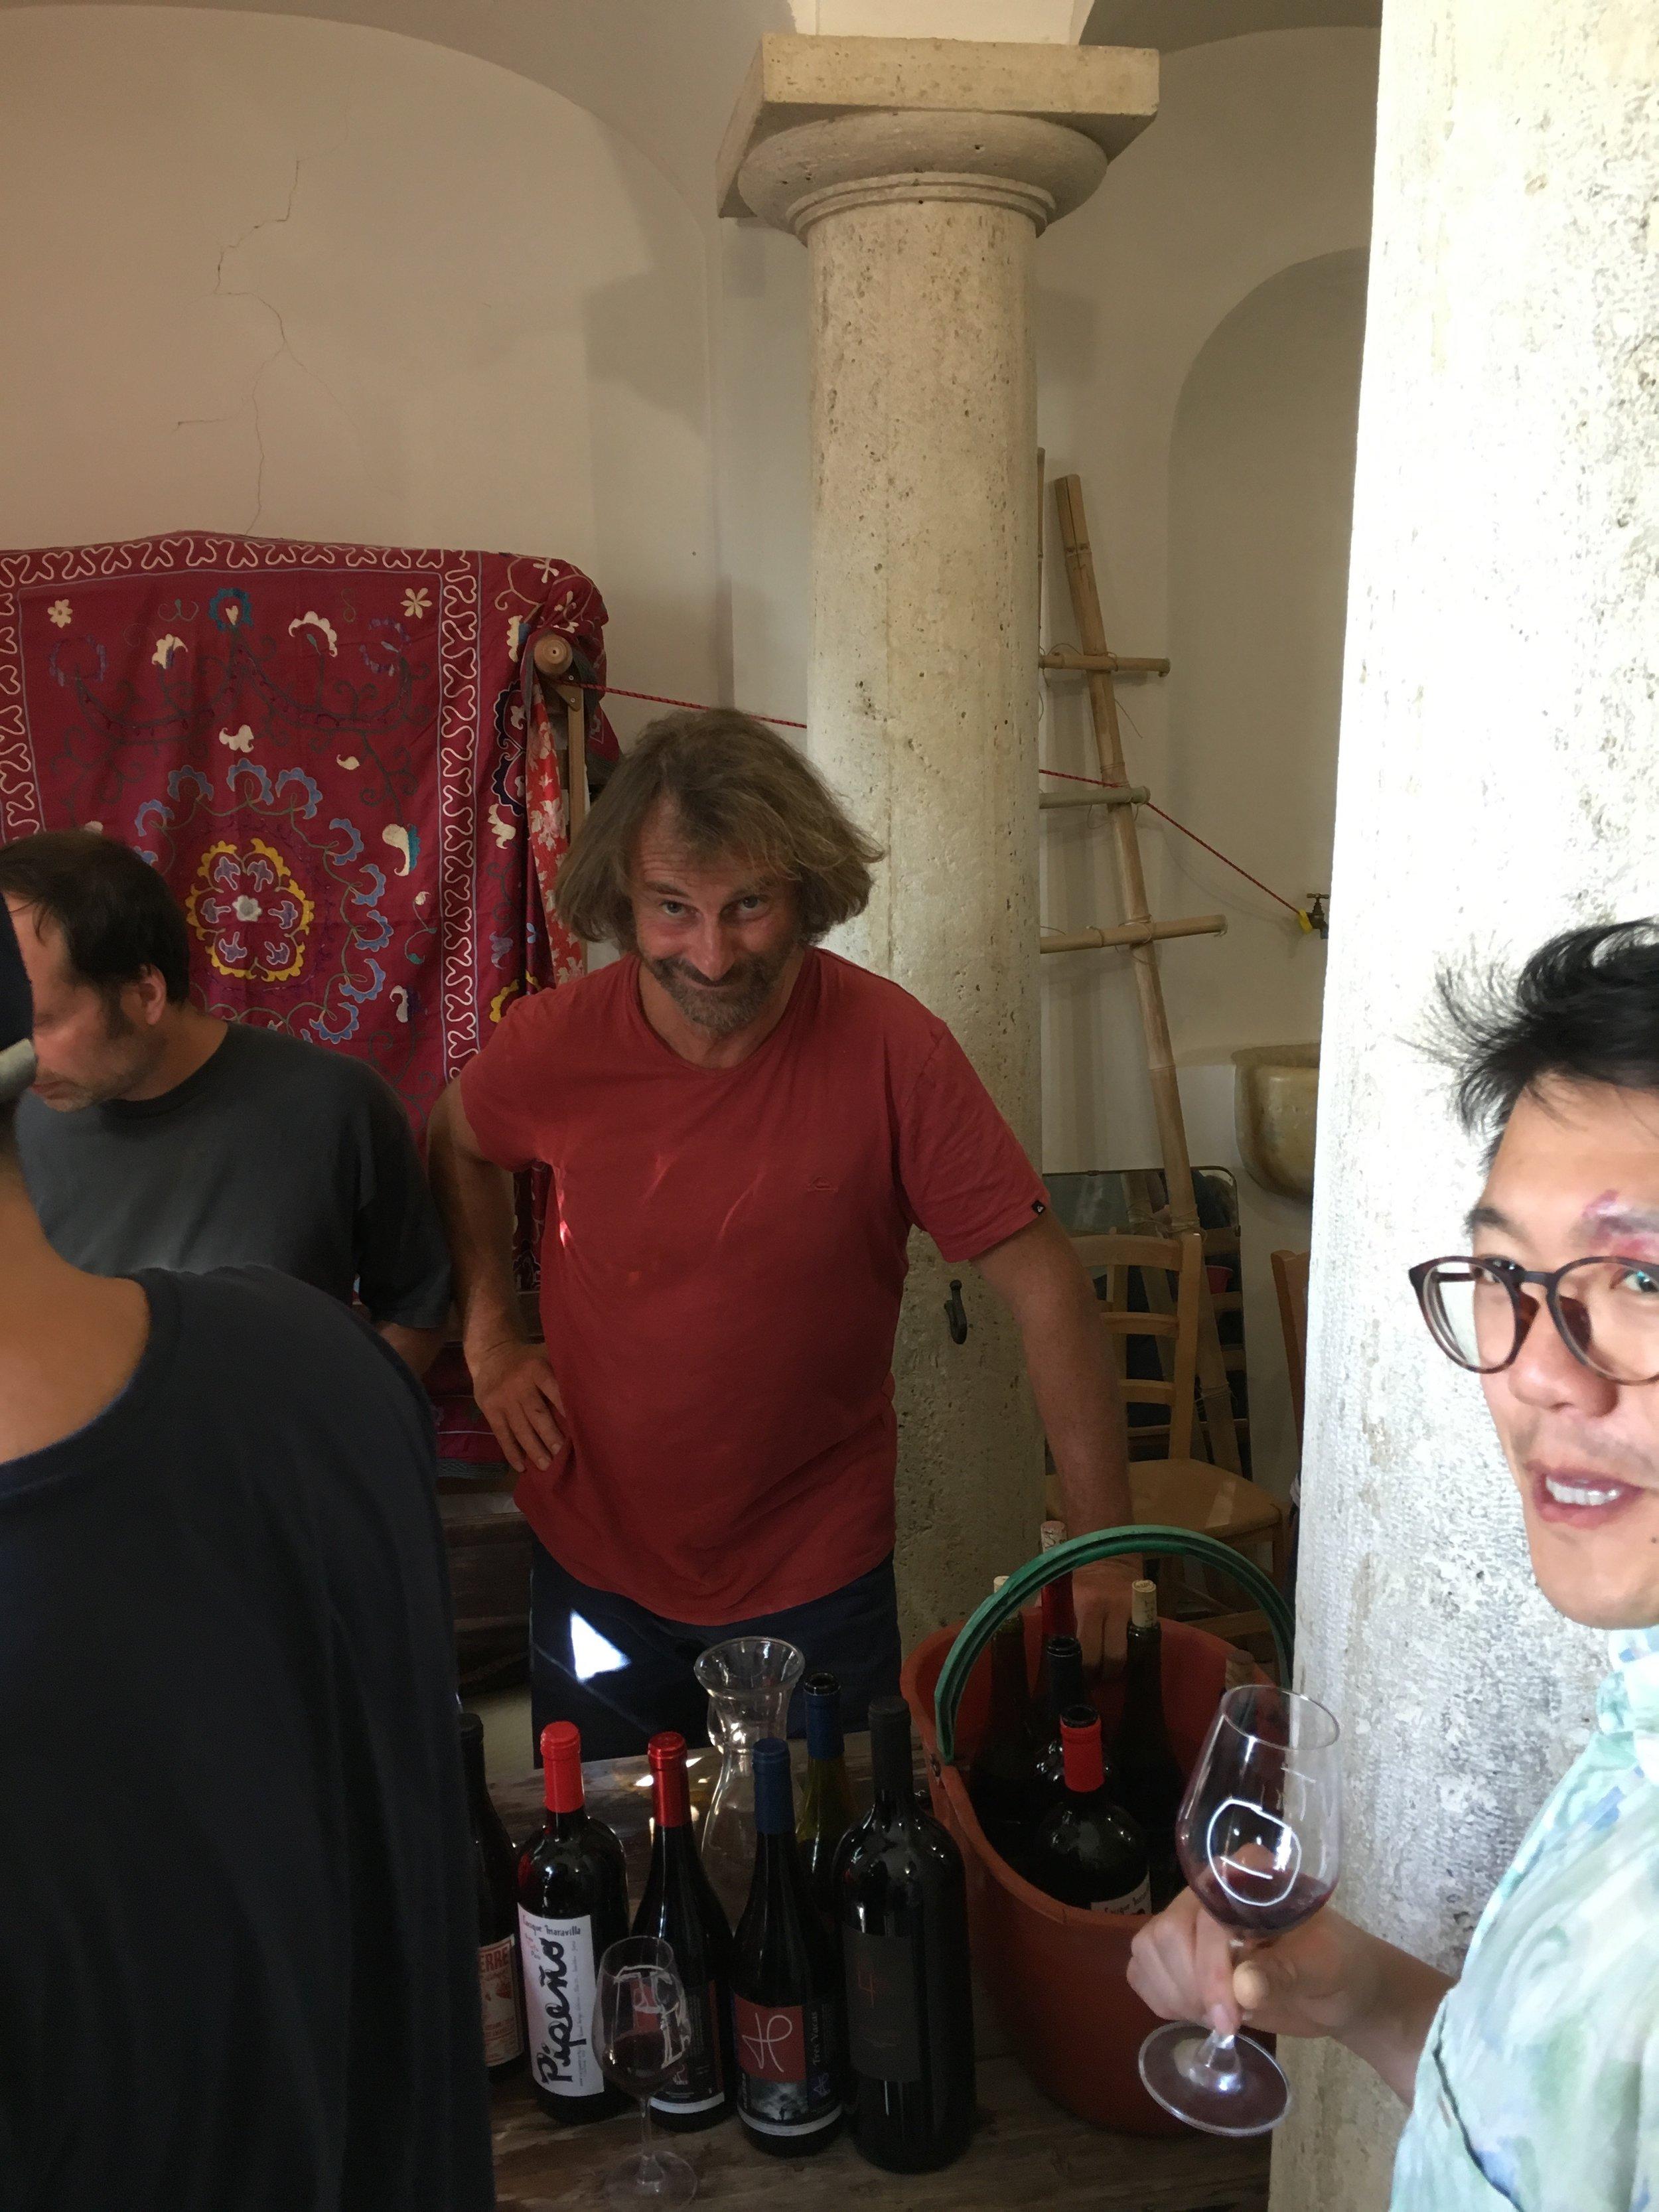 festa_del_vino17.jpg